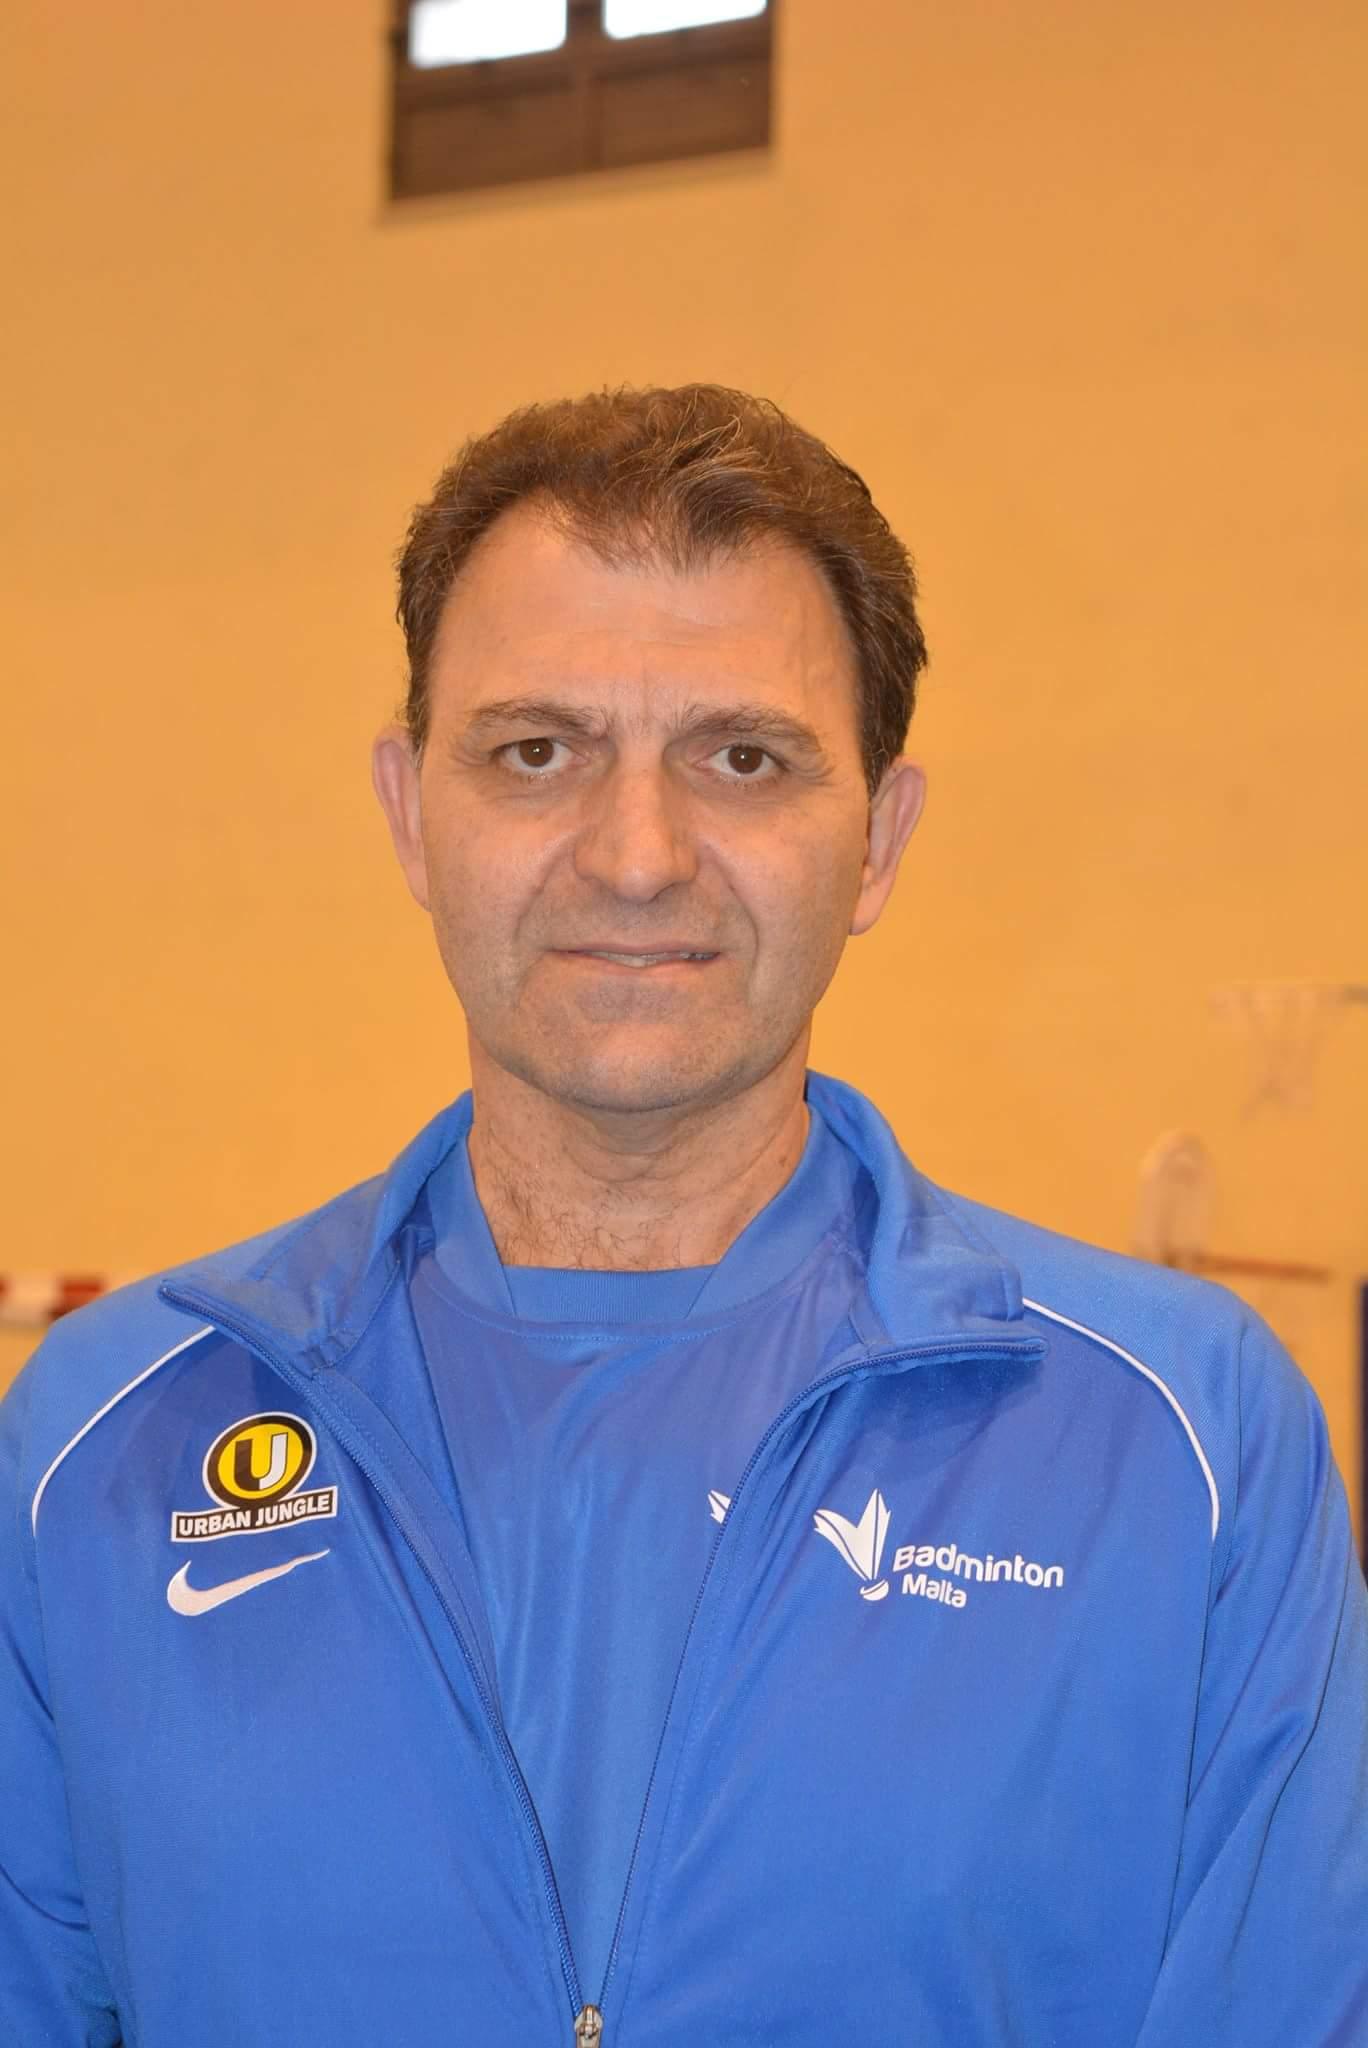 Martin Farrugia